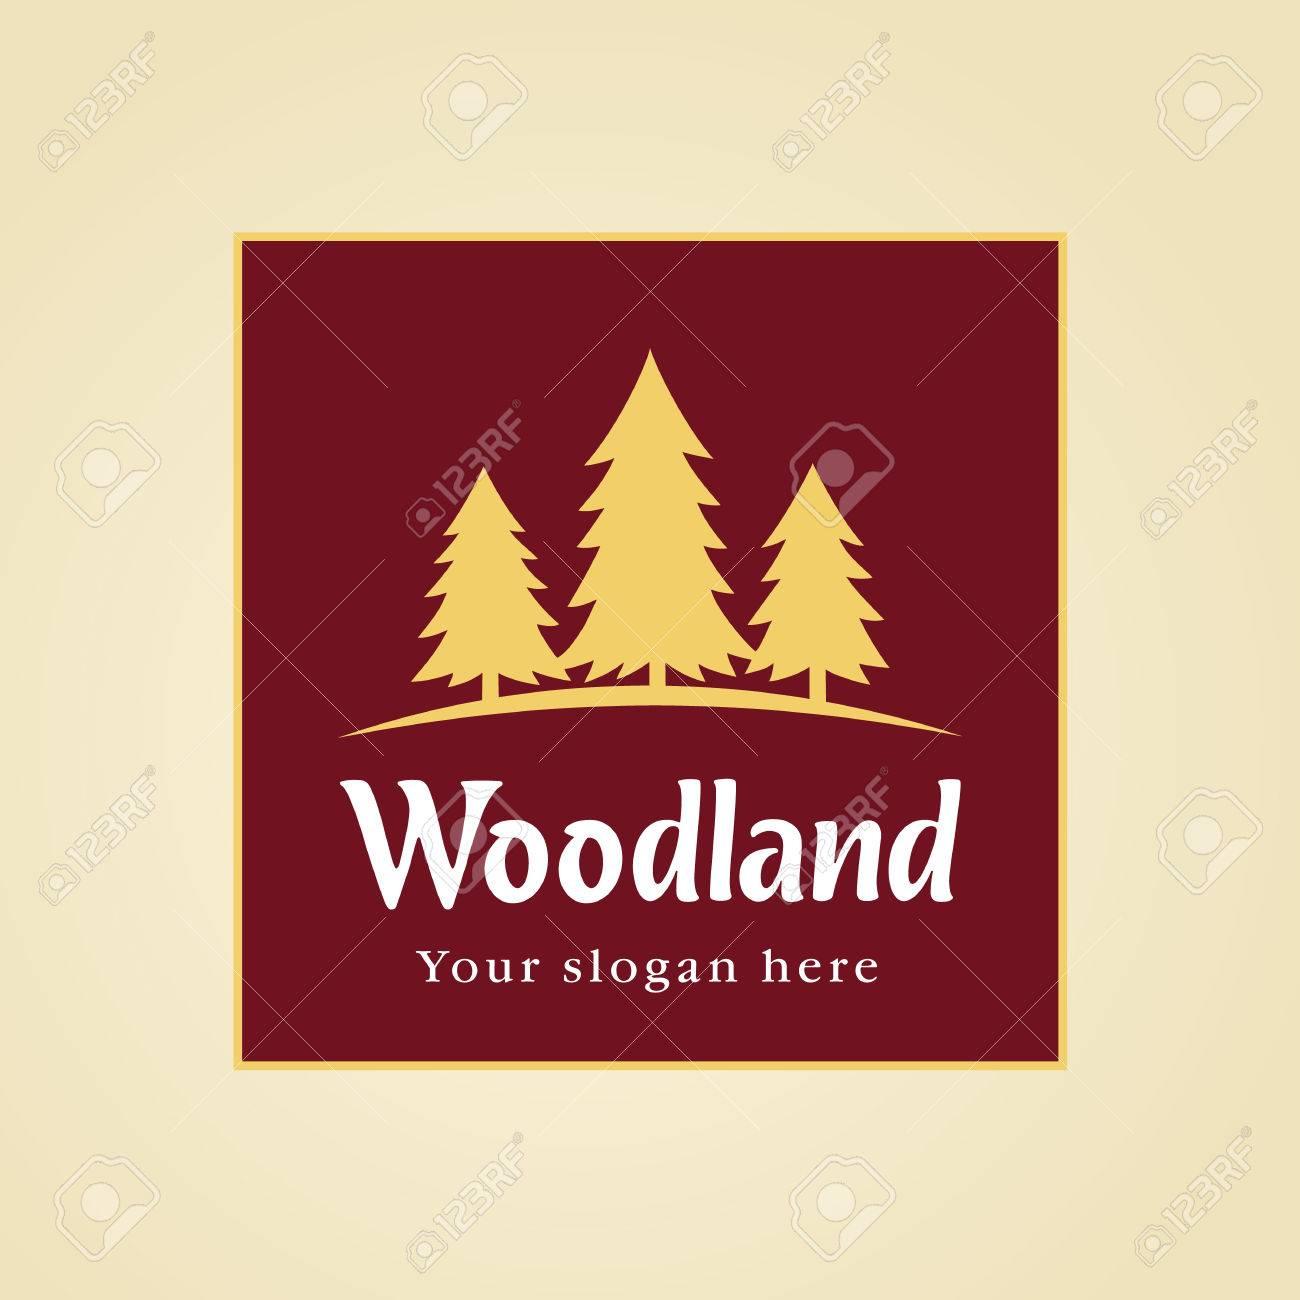 Wood Land Vector Logo Landscaping Business Company Garden Service